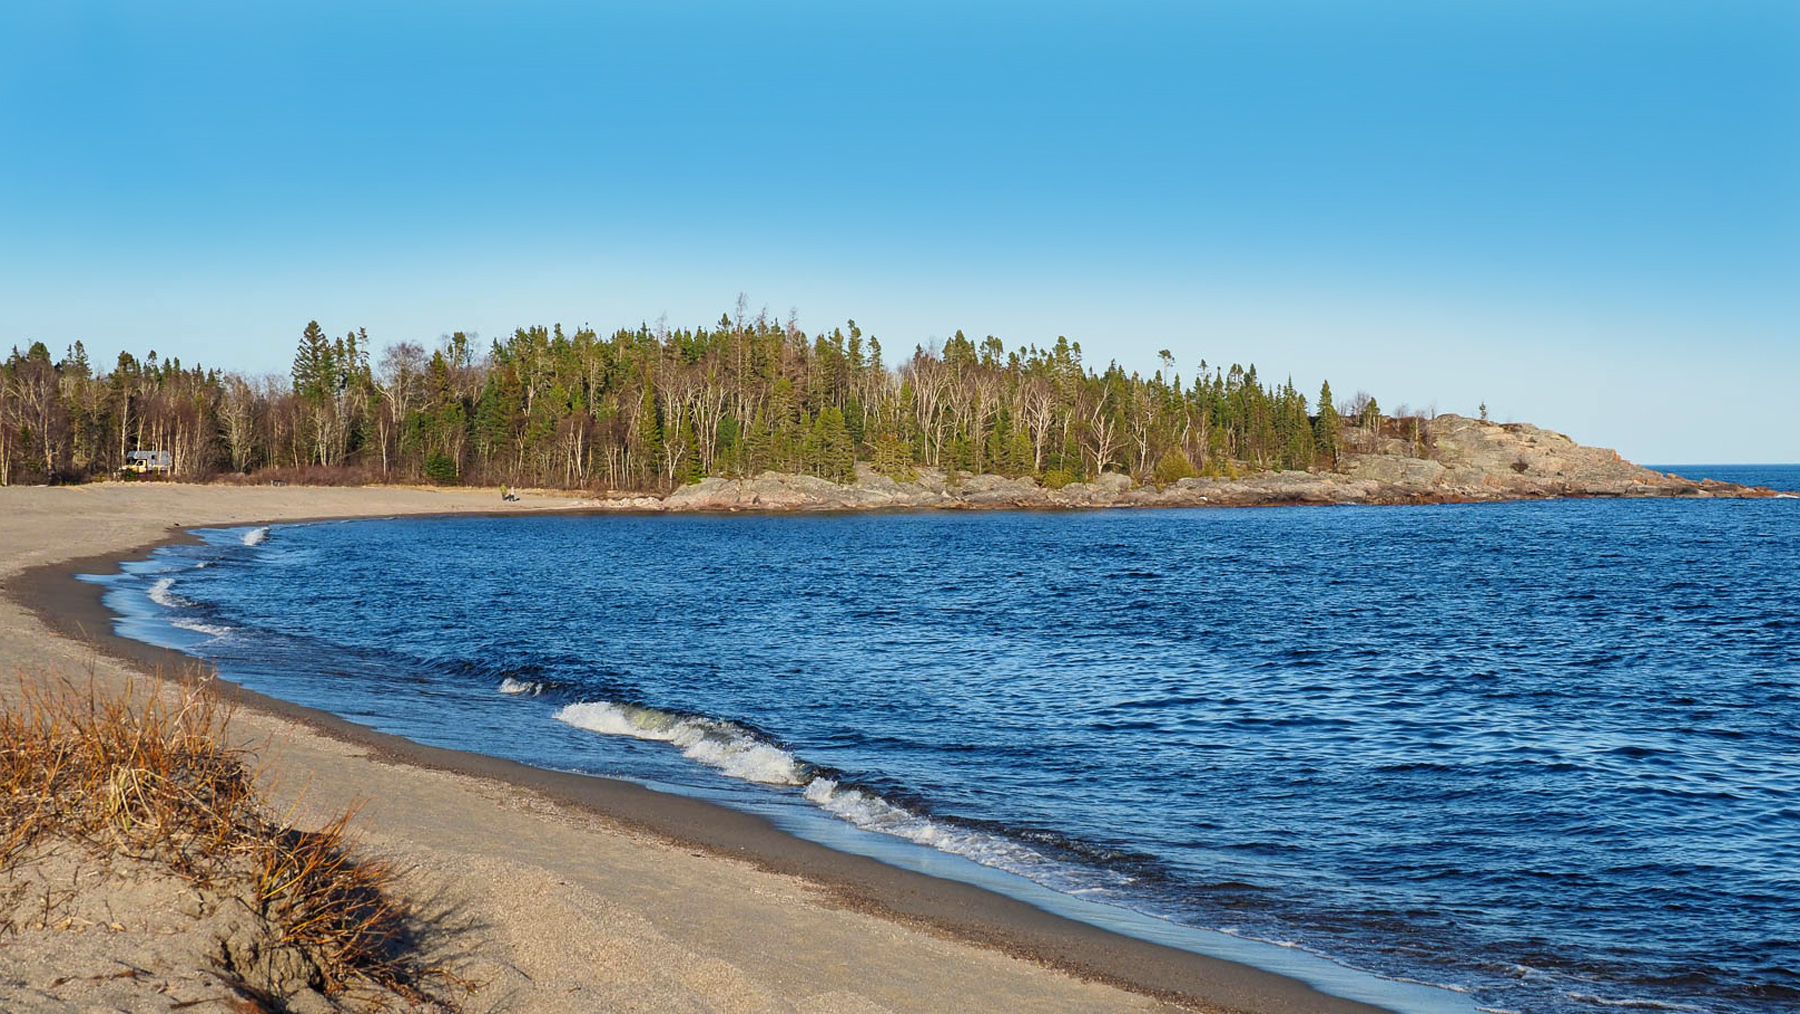 Lake Superior, Schlafplatz bei Terrace bay